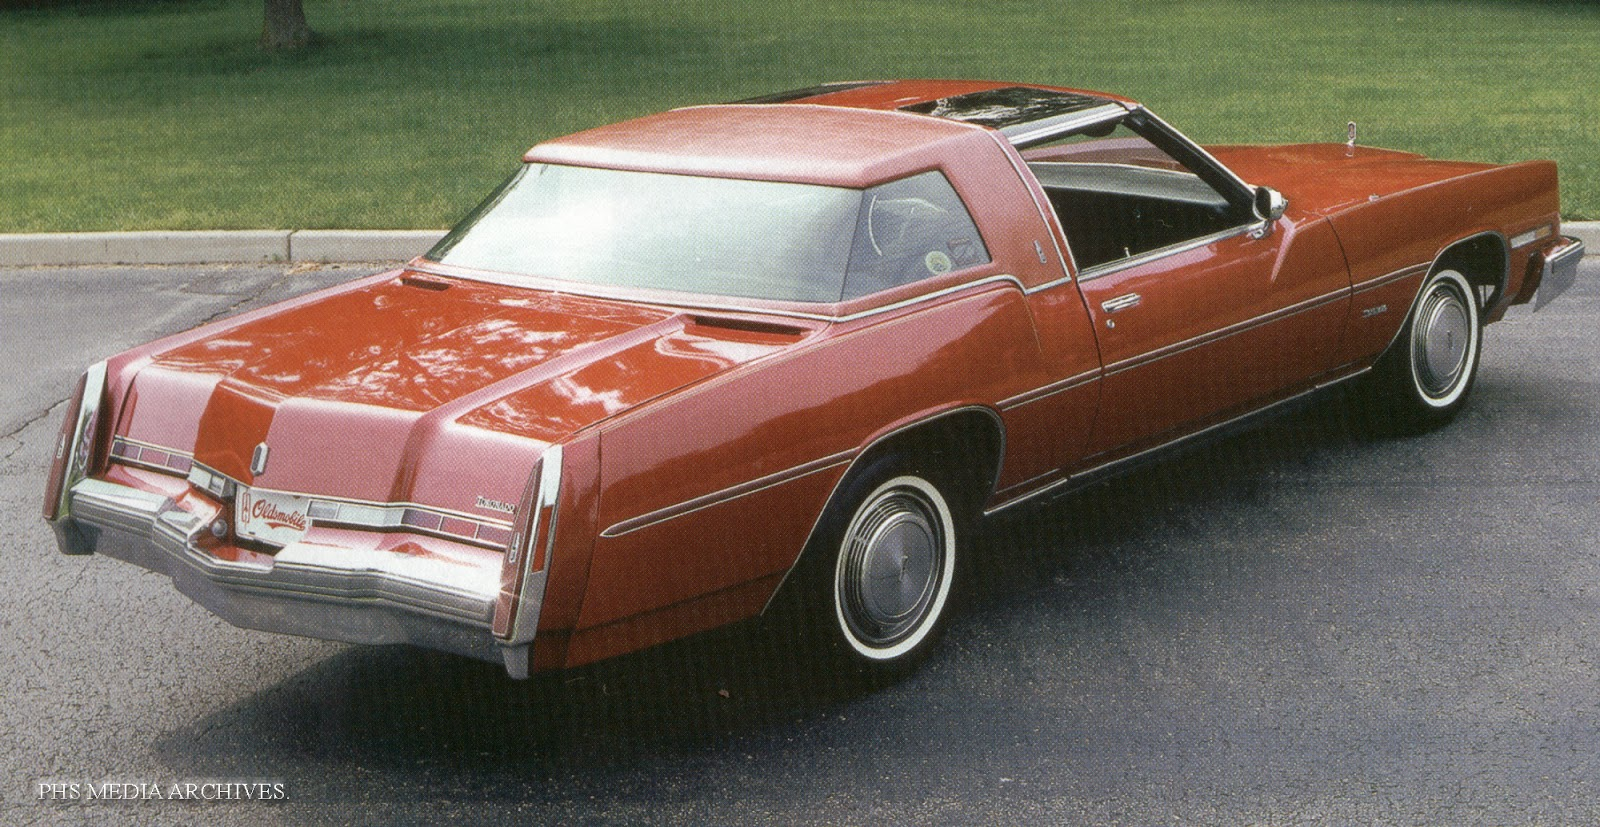 WRG-7511] 1971 Oldsmobile Toronado Wiring Diagrams on